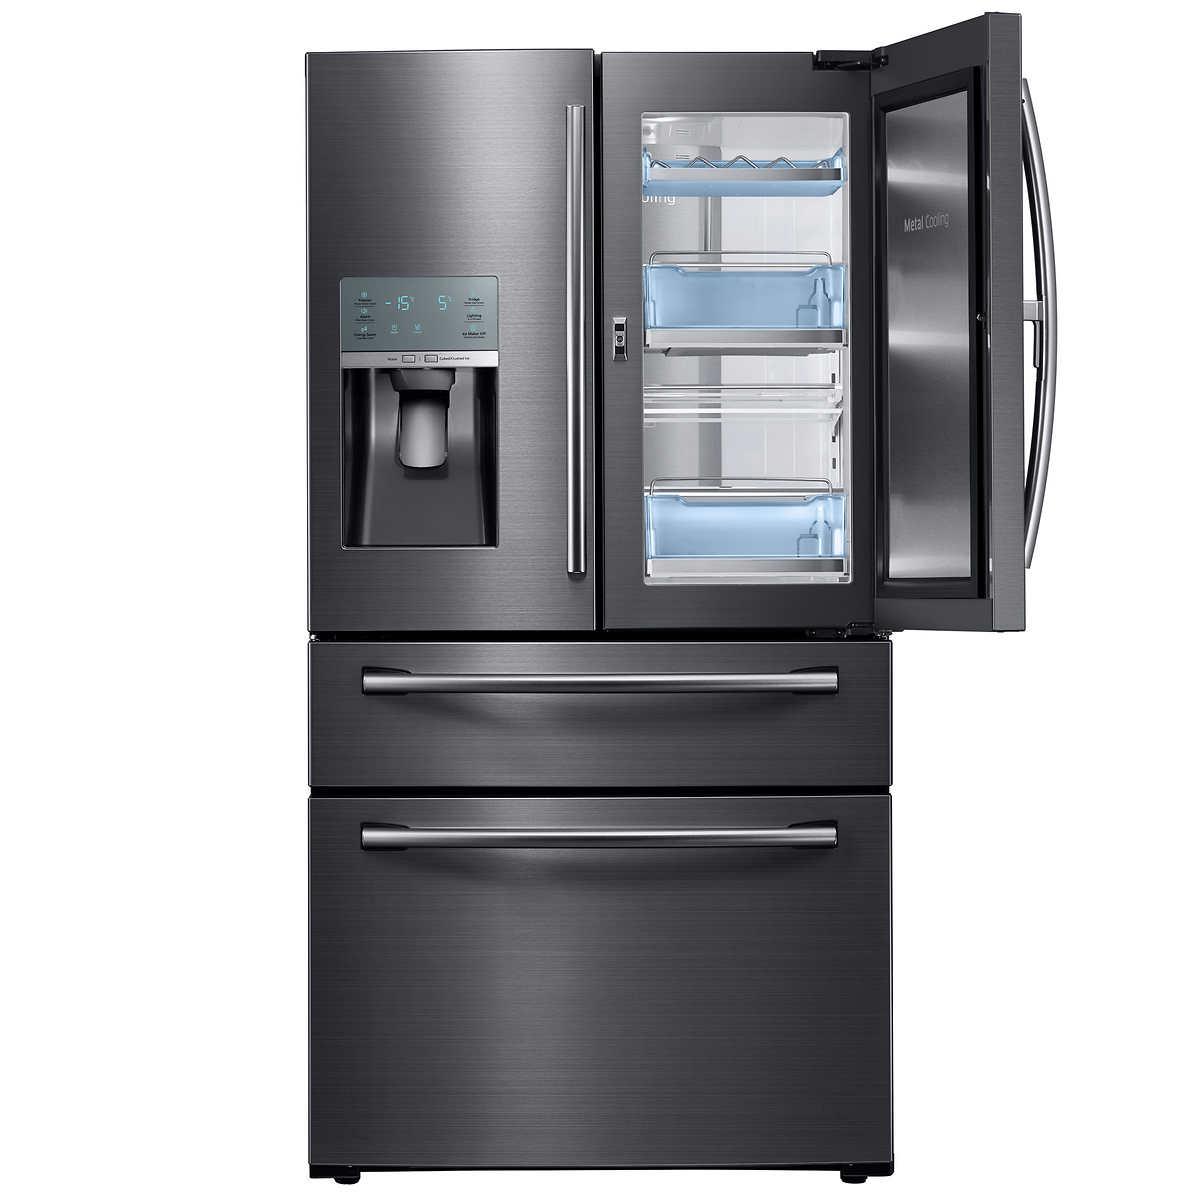 Counter Depth Refrigerator Only Refrigerators Costco